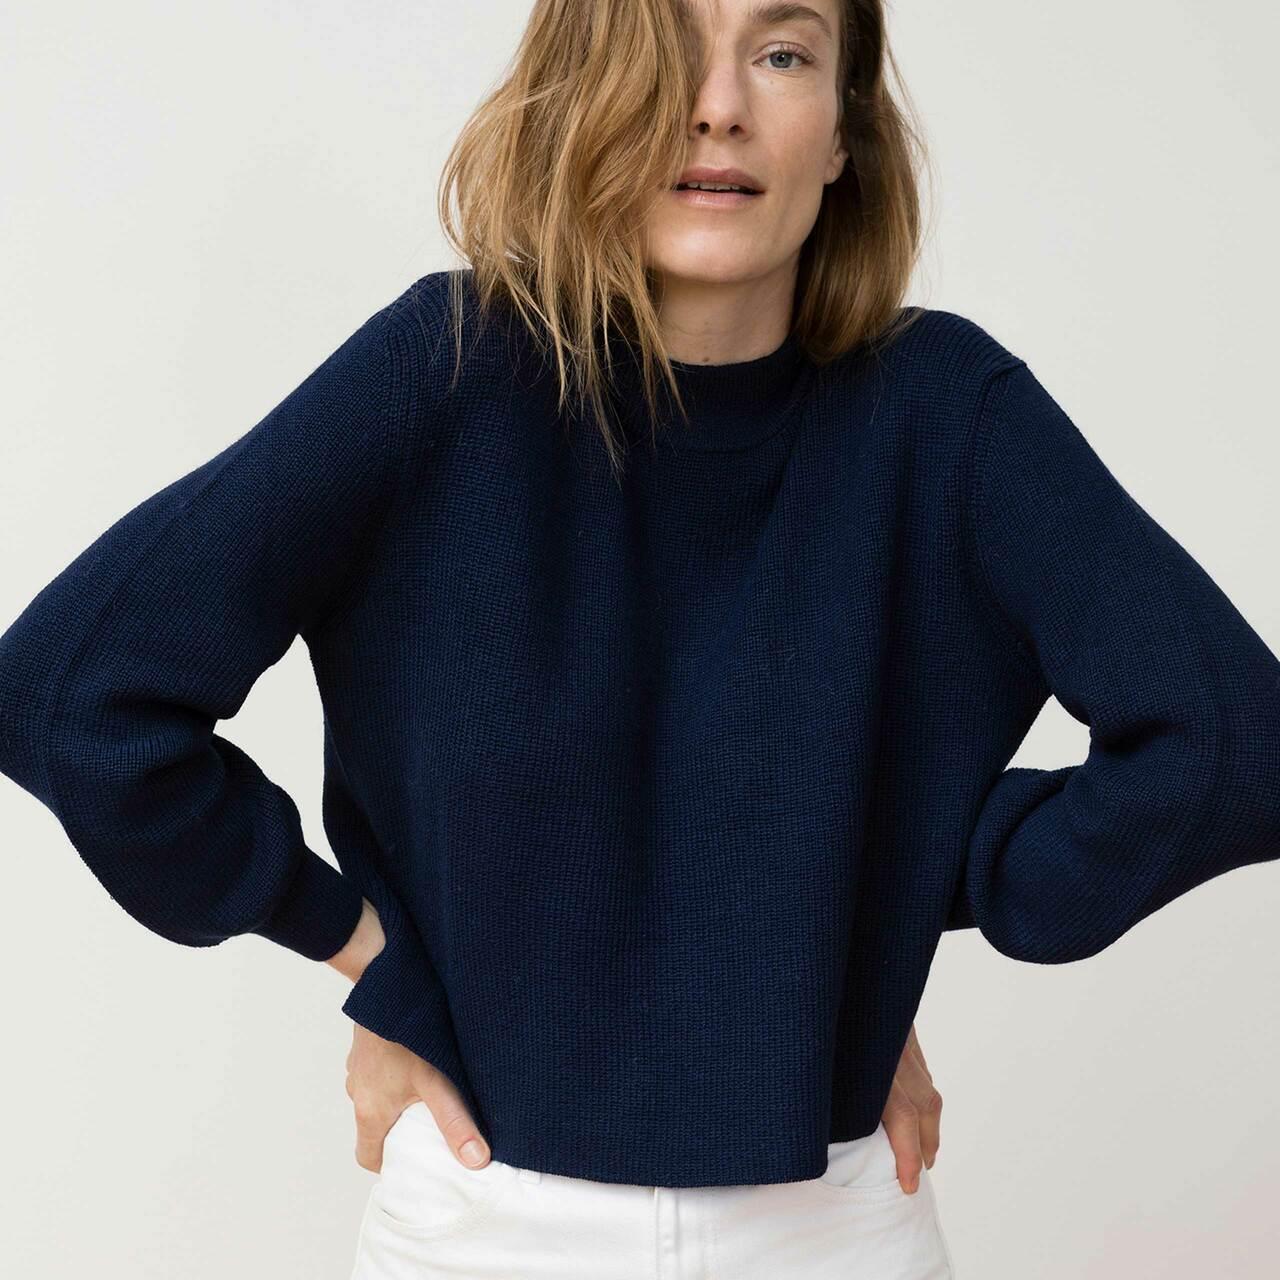 Jungle Folk Helo Sweater von 'Jungle Folk' Navy Blue